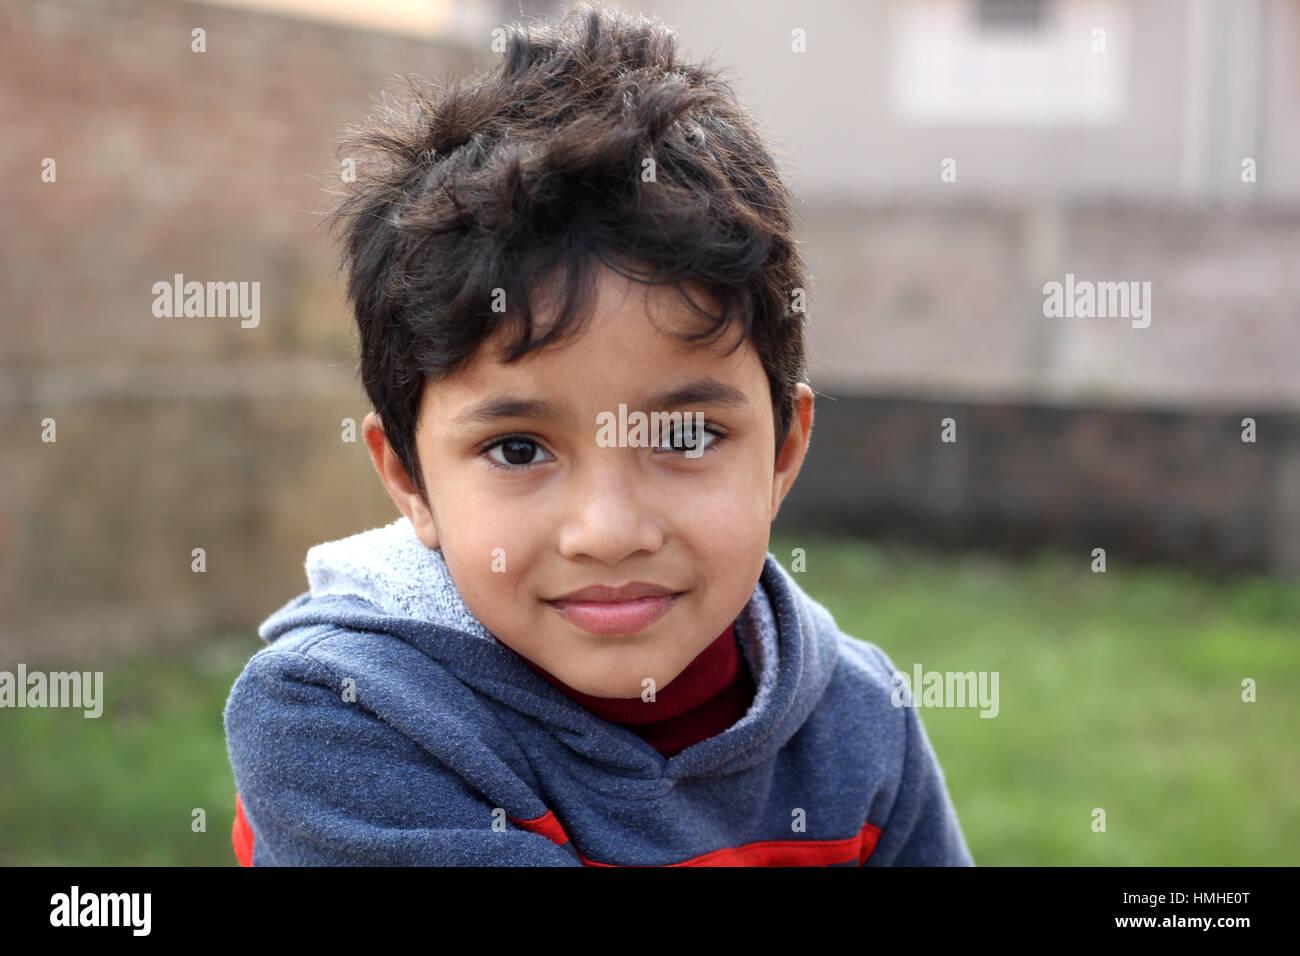 Hellem Teint lächelnd cute Indian Kid Stockbild